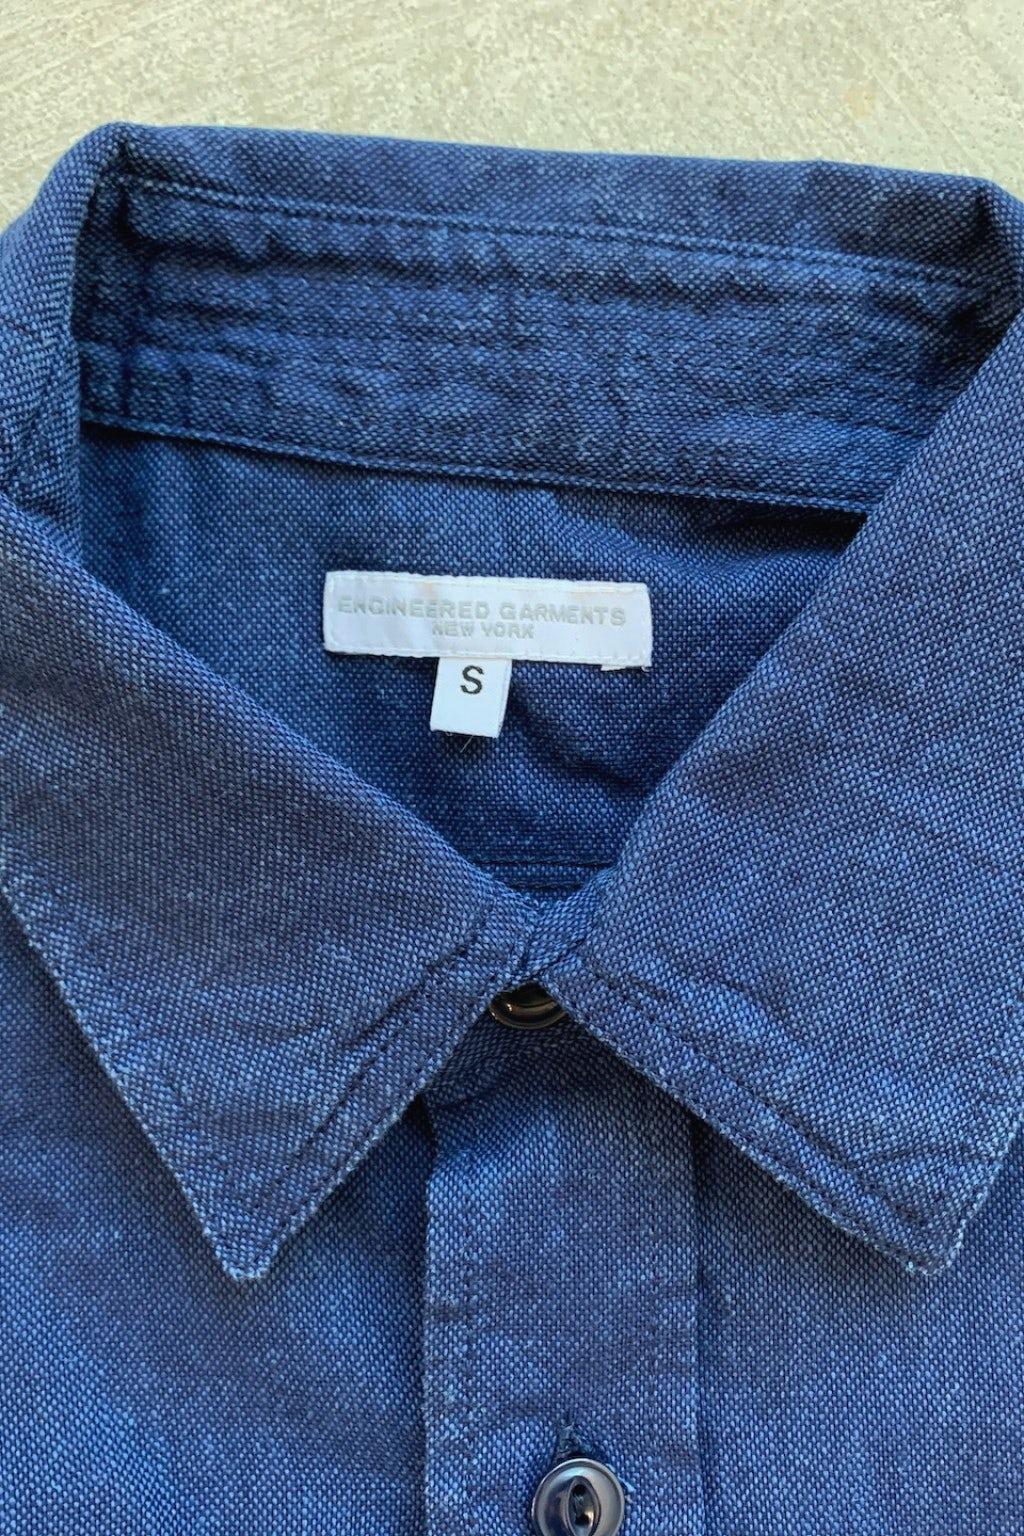 Engineered Garments Work Shirt Navy